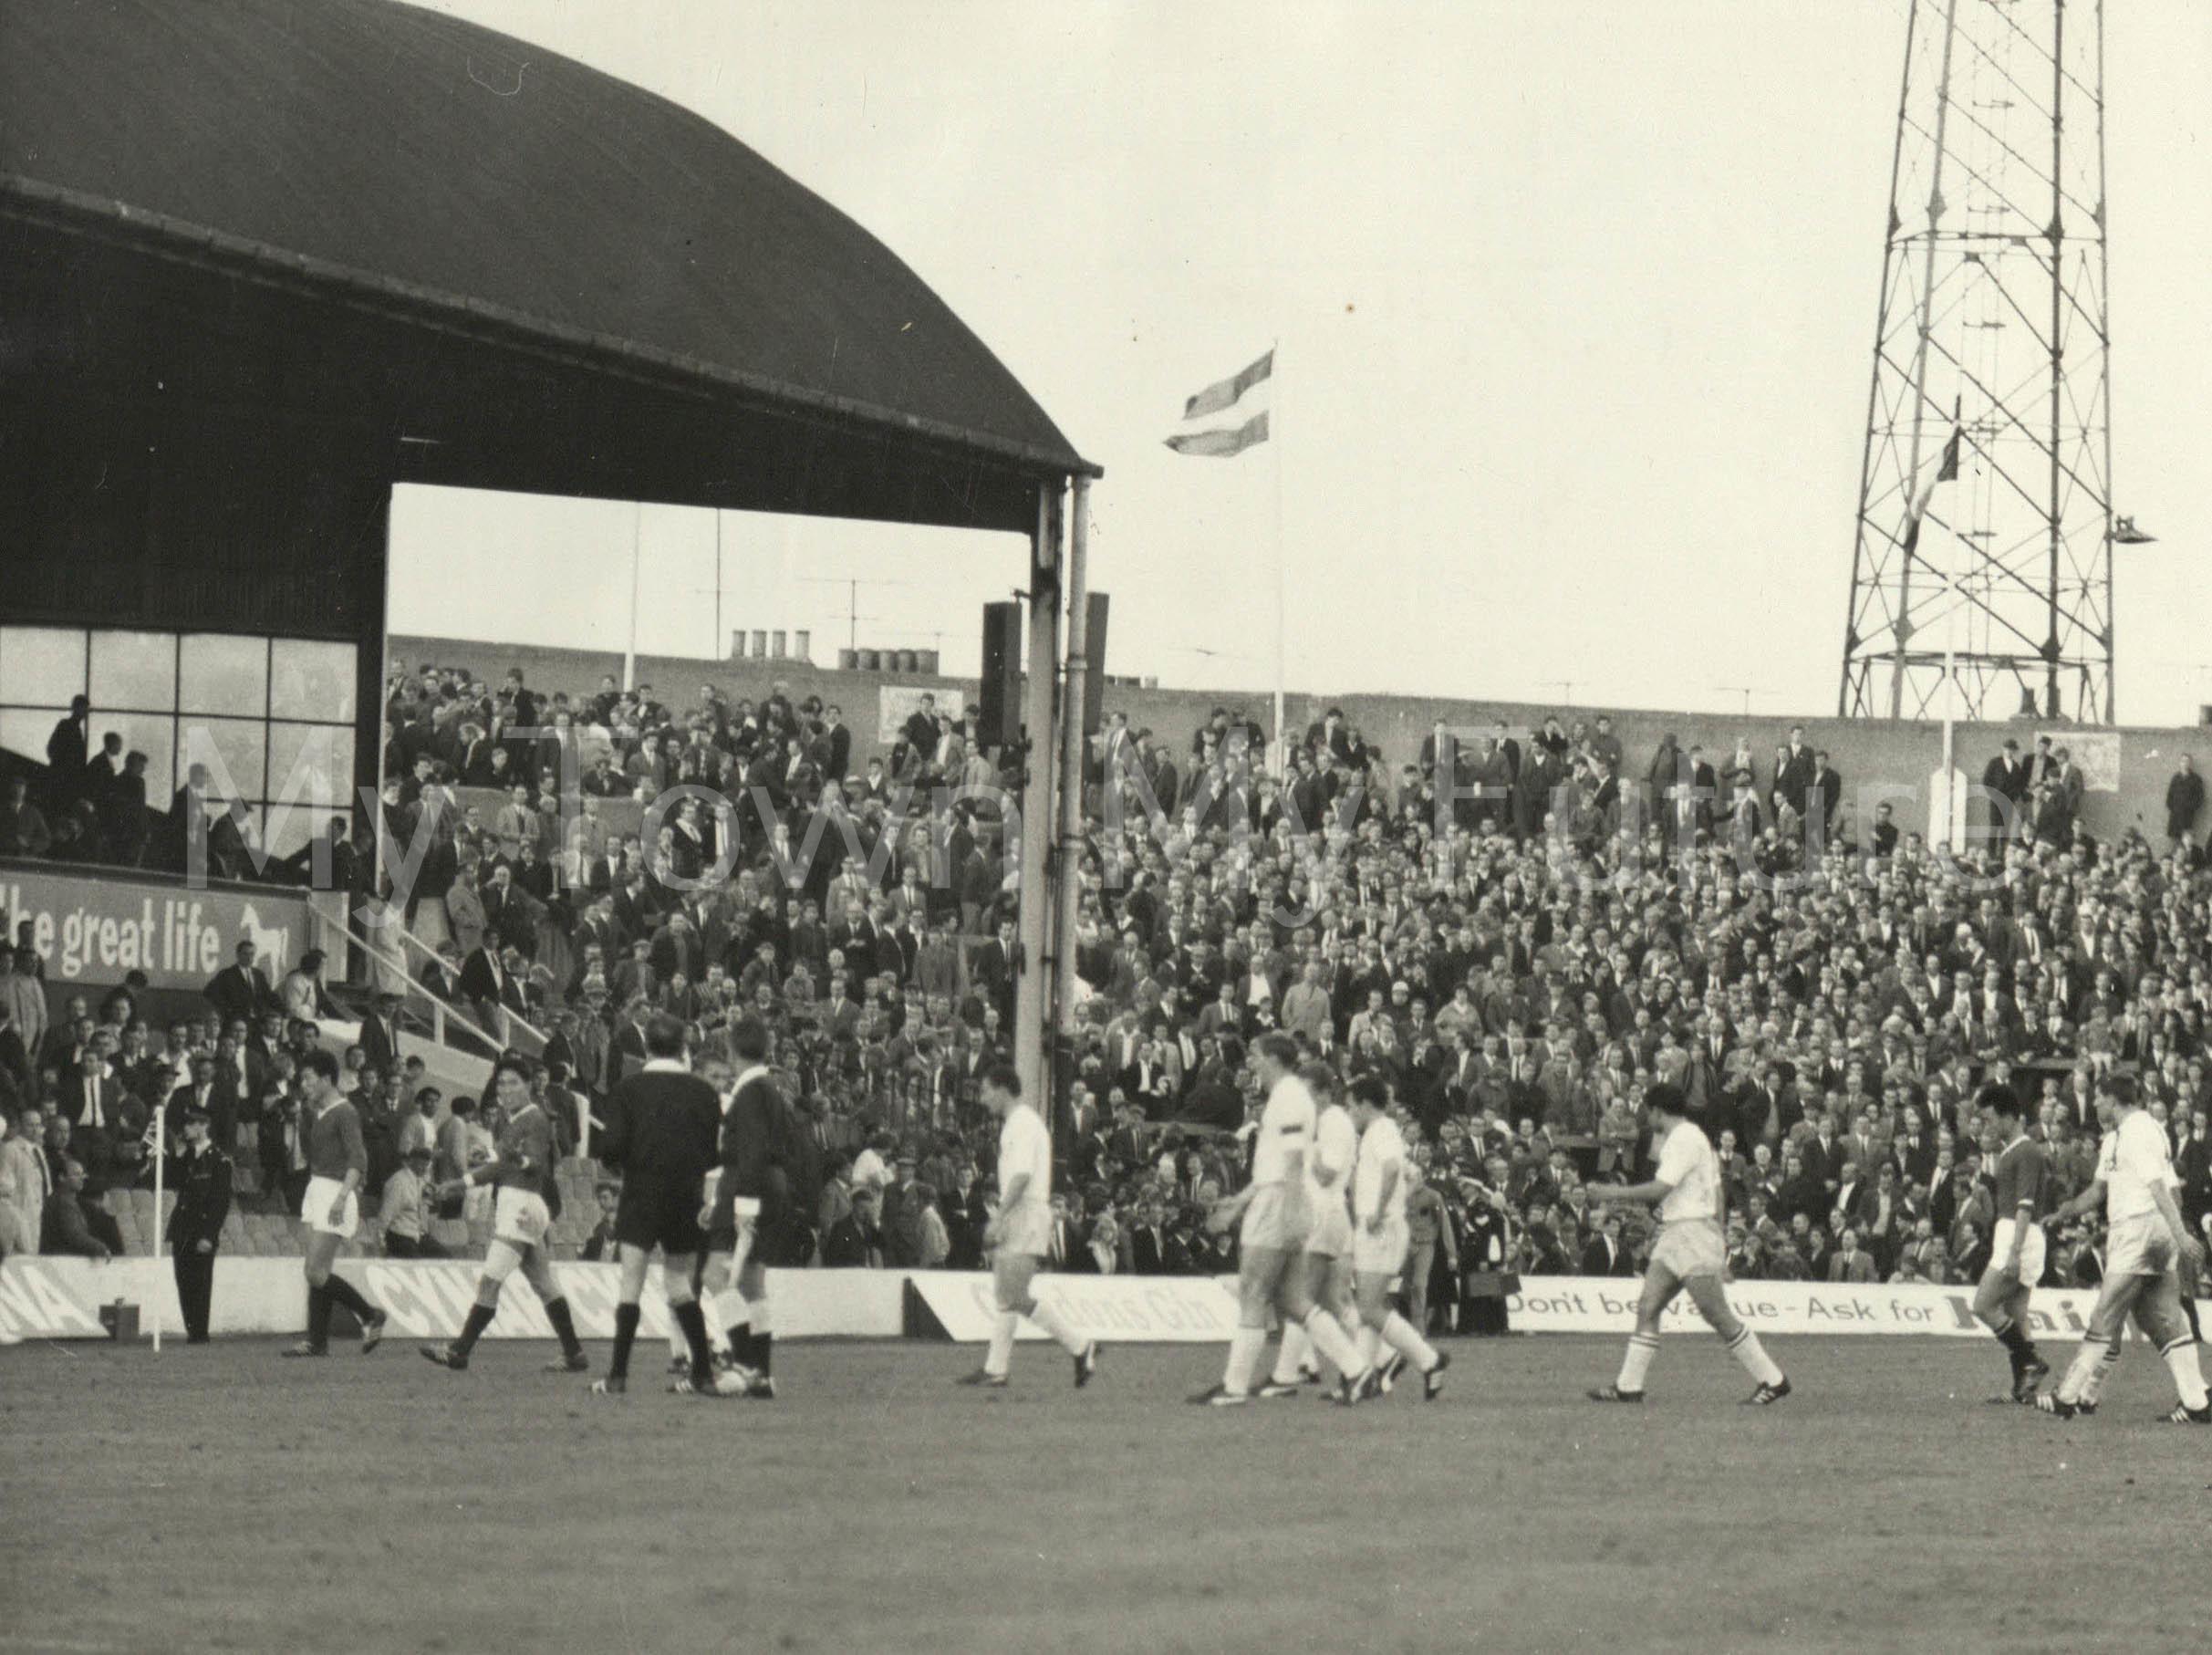 World Cup North Korea v USSR 1966